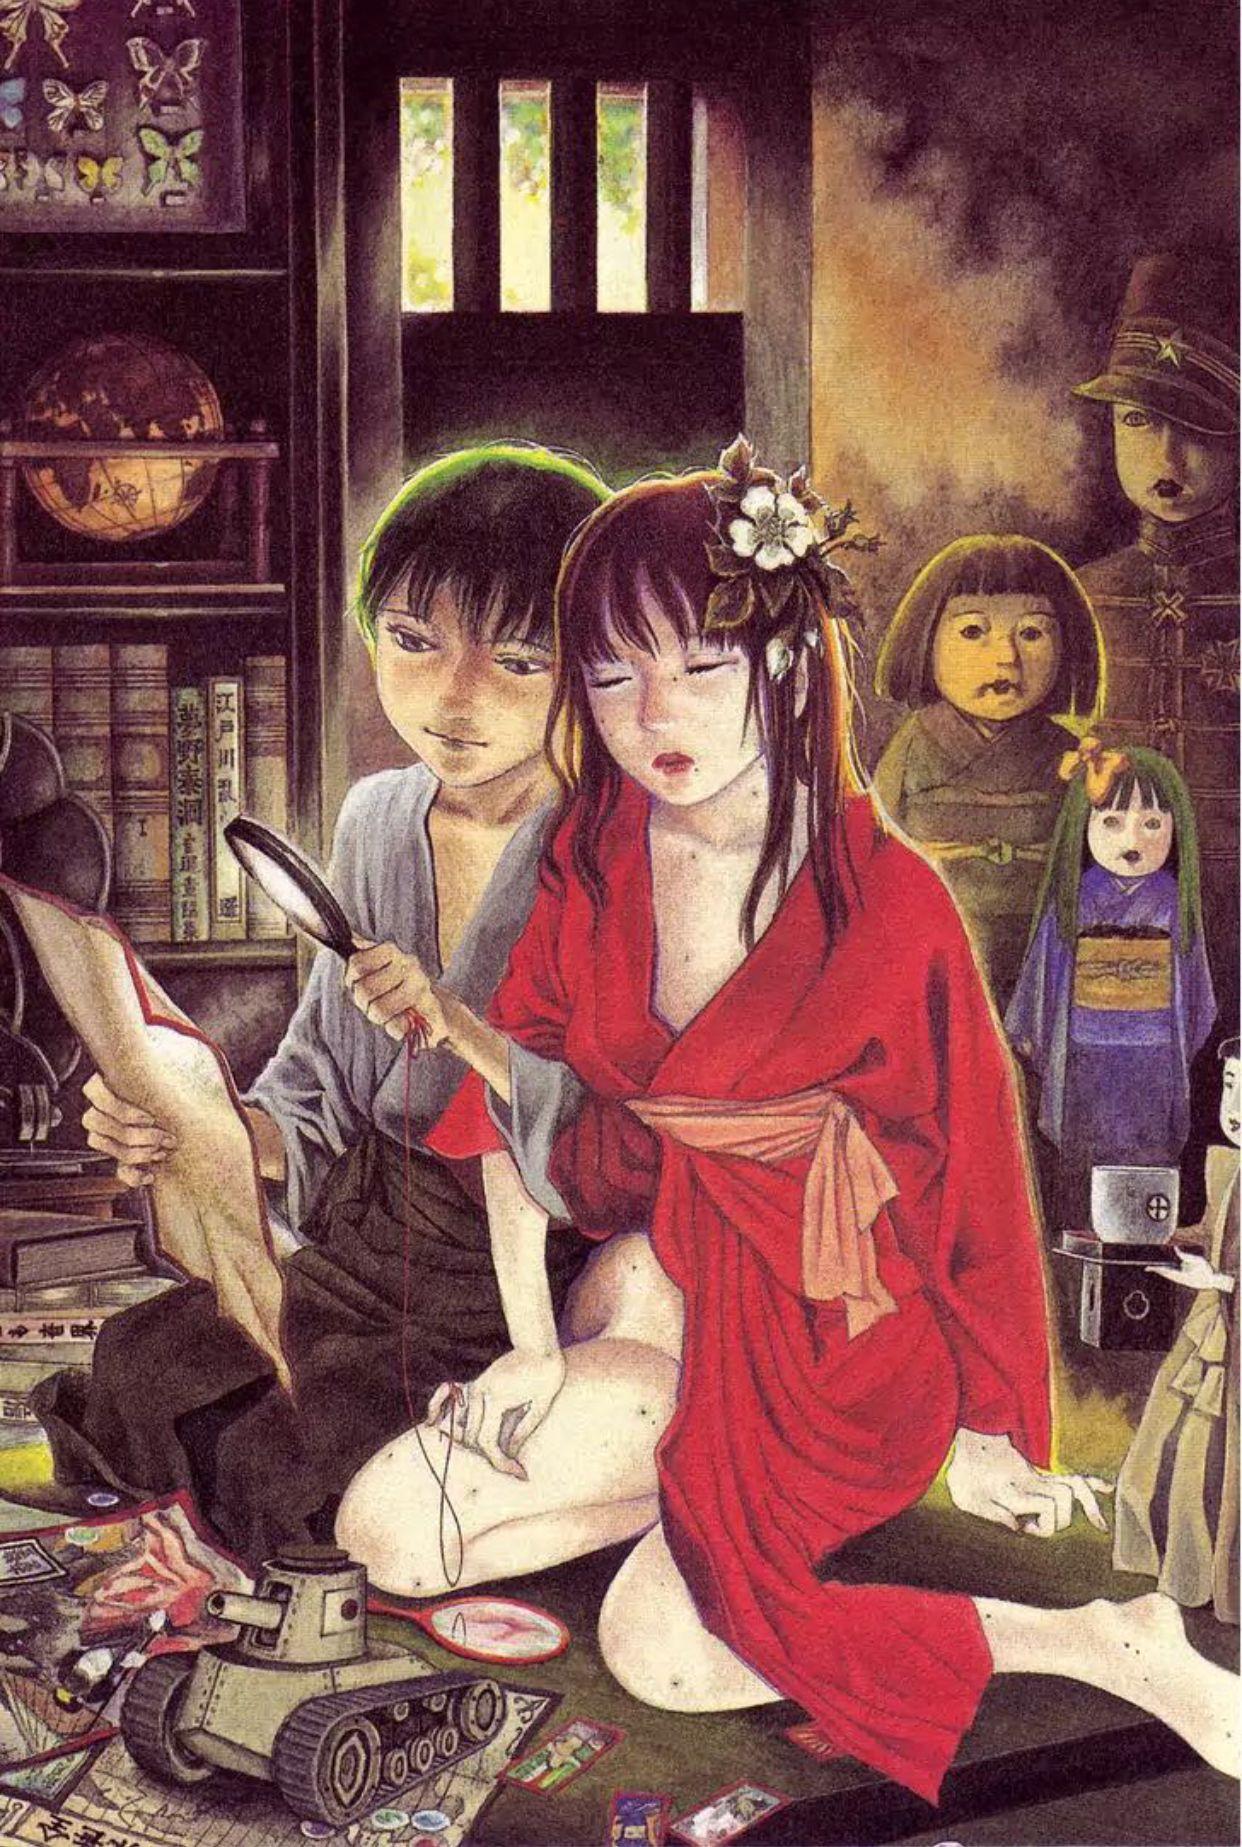 Barairo mitsubachi online dating